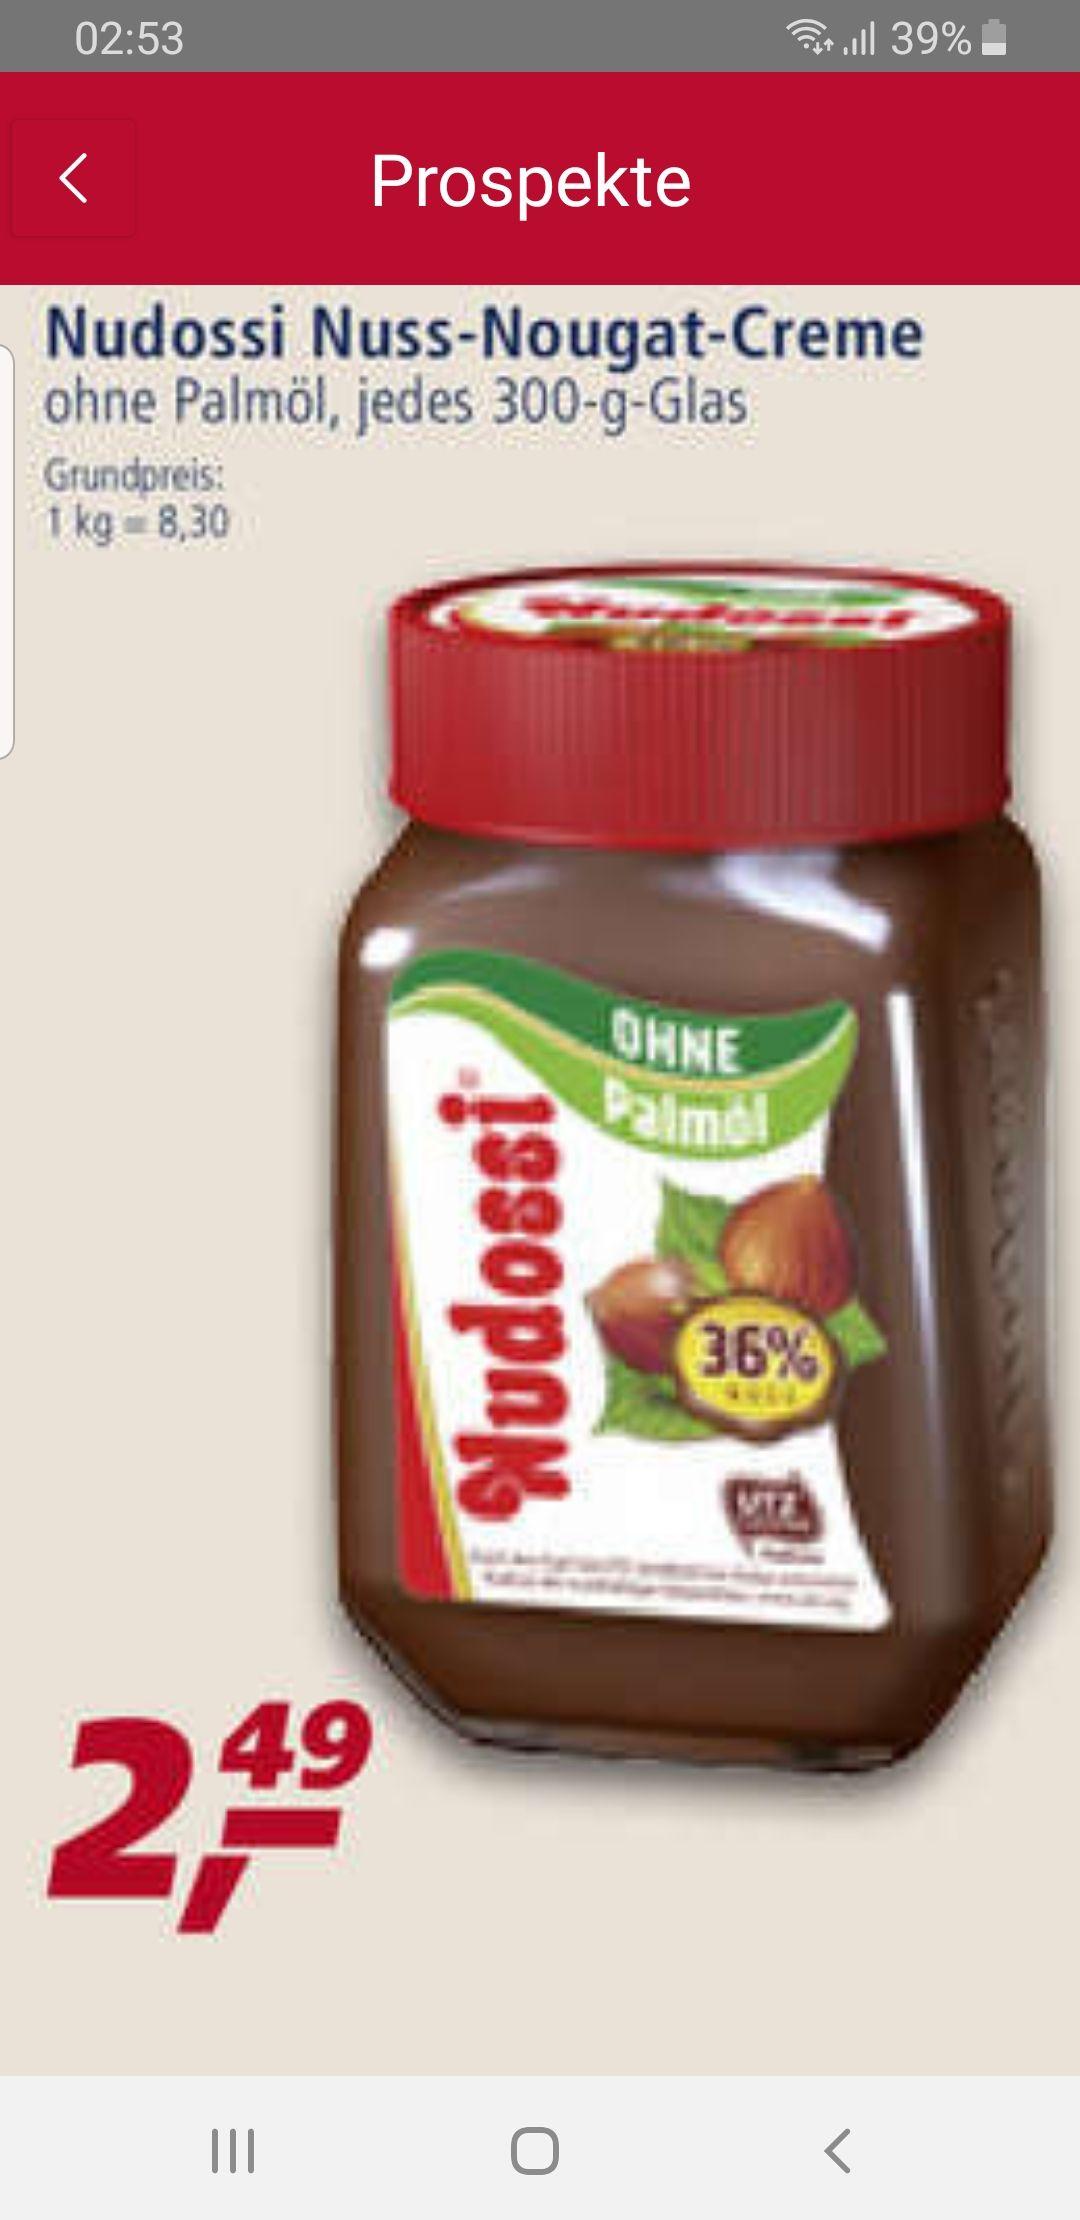 Nudossi Nuss Nougat Creme 300gr ohne Palmöl ab Montag bei real